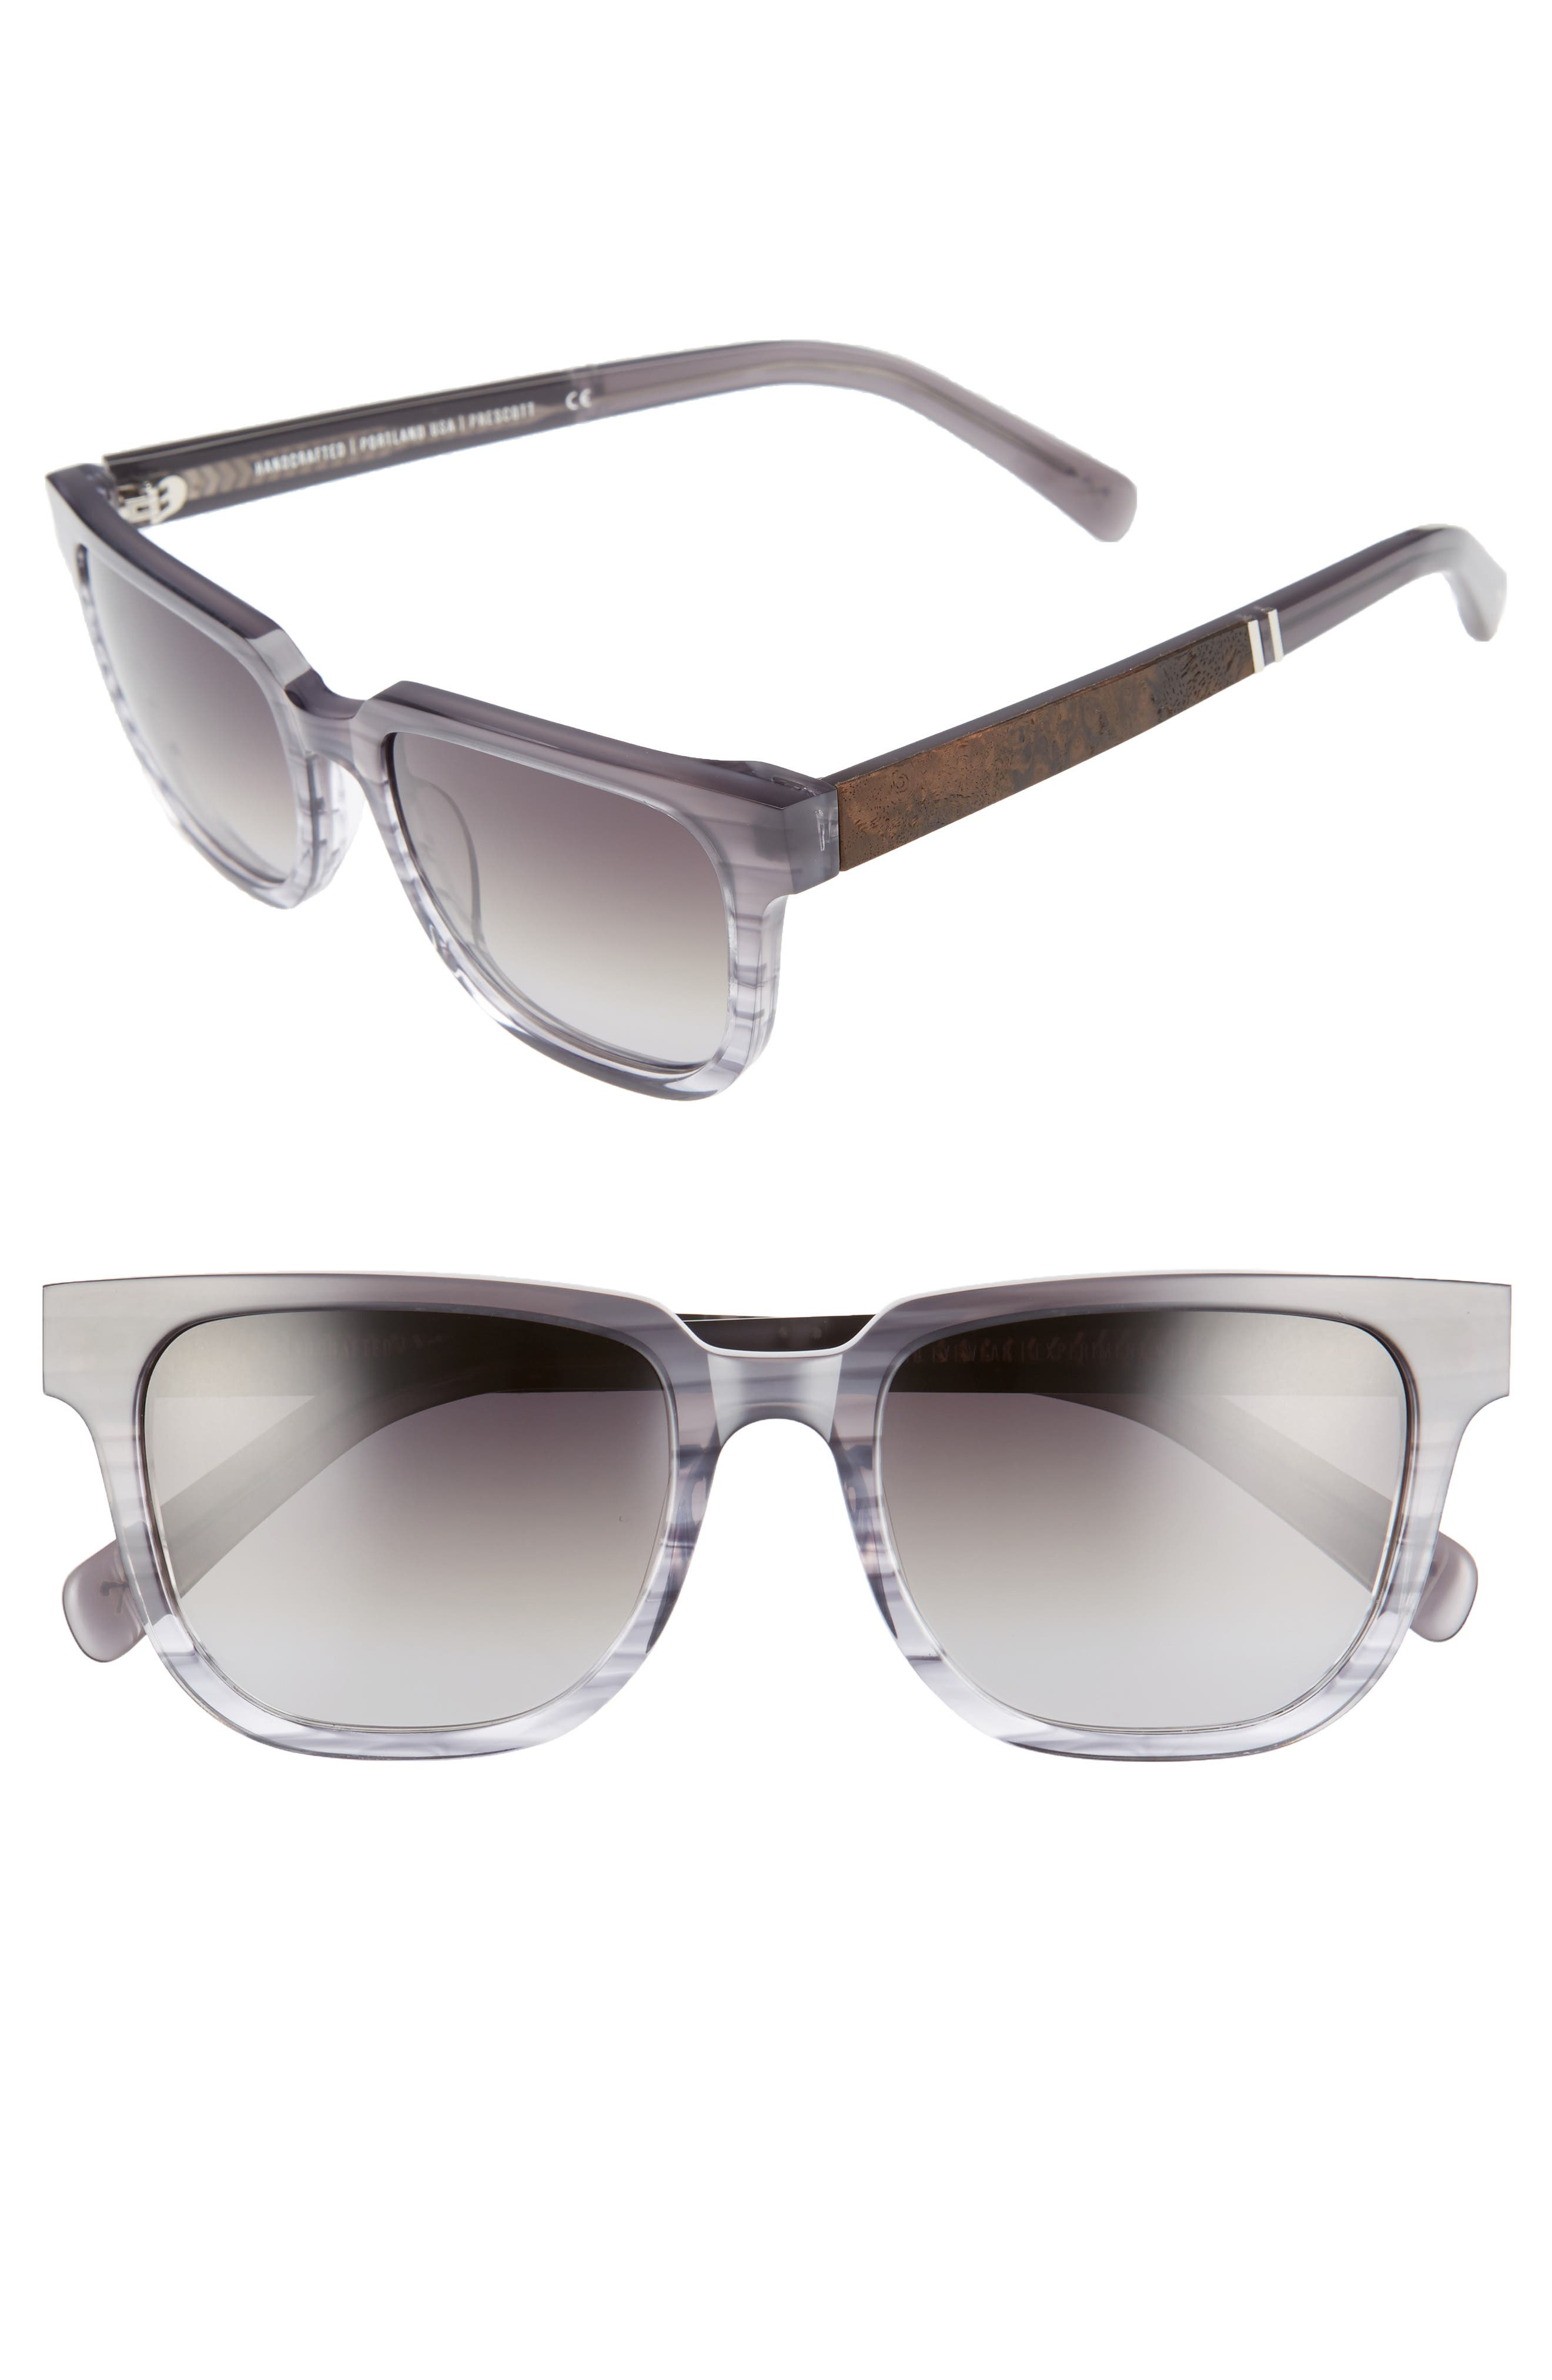 Shwood 'Prescott' 52mm Acetate & Wood Polarized Sunglasses